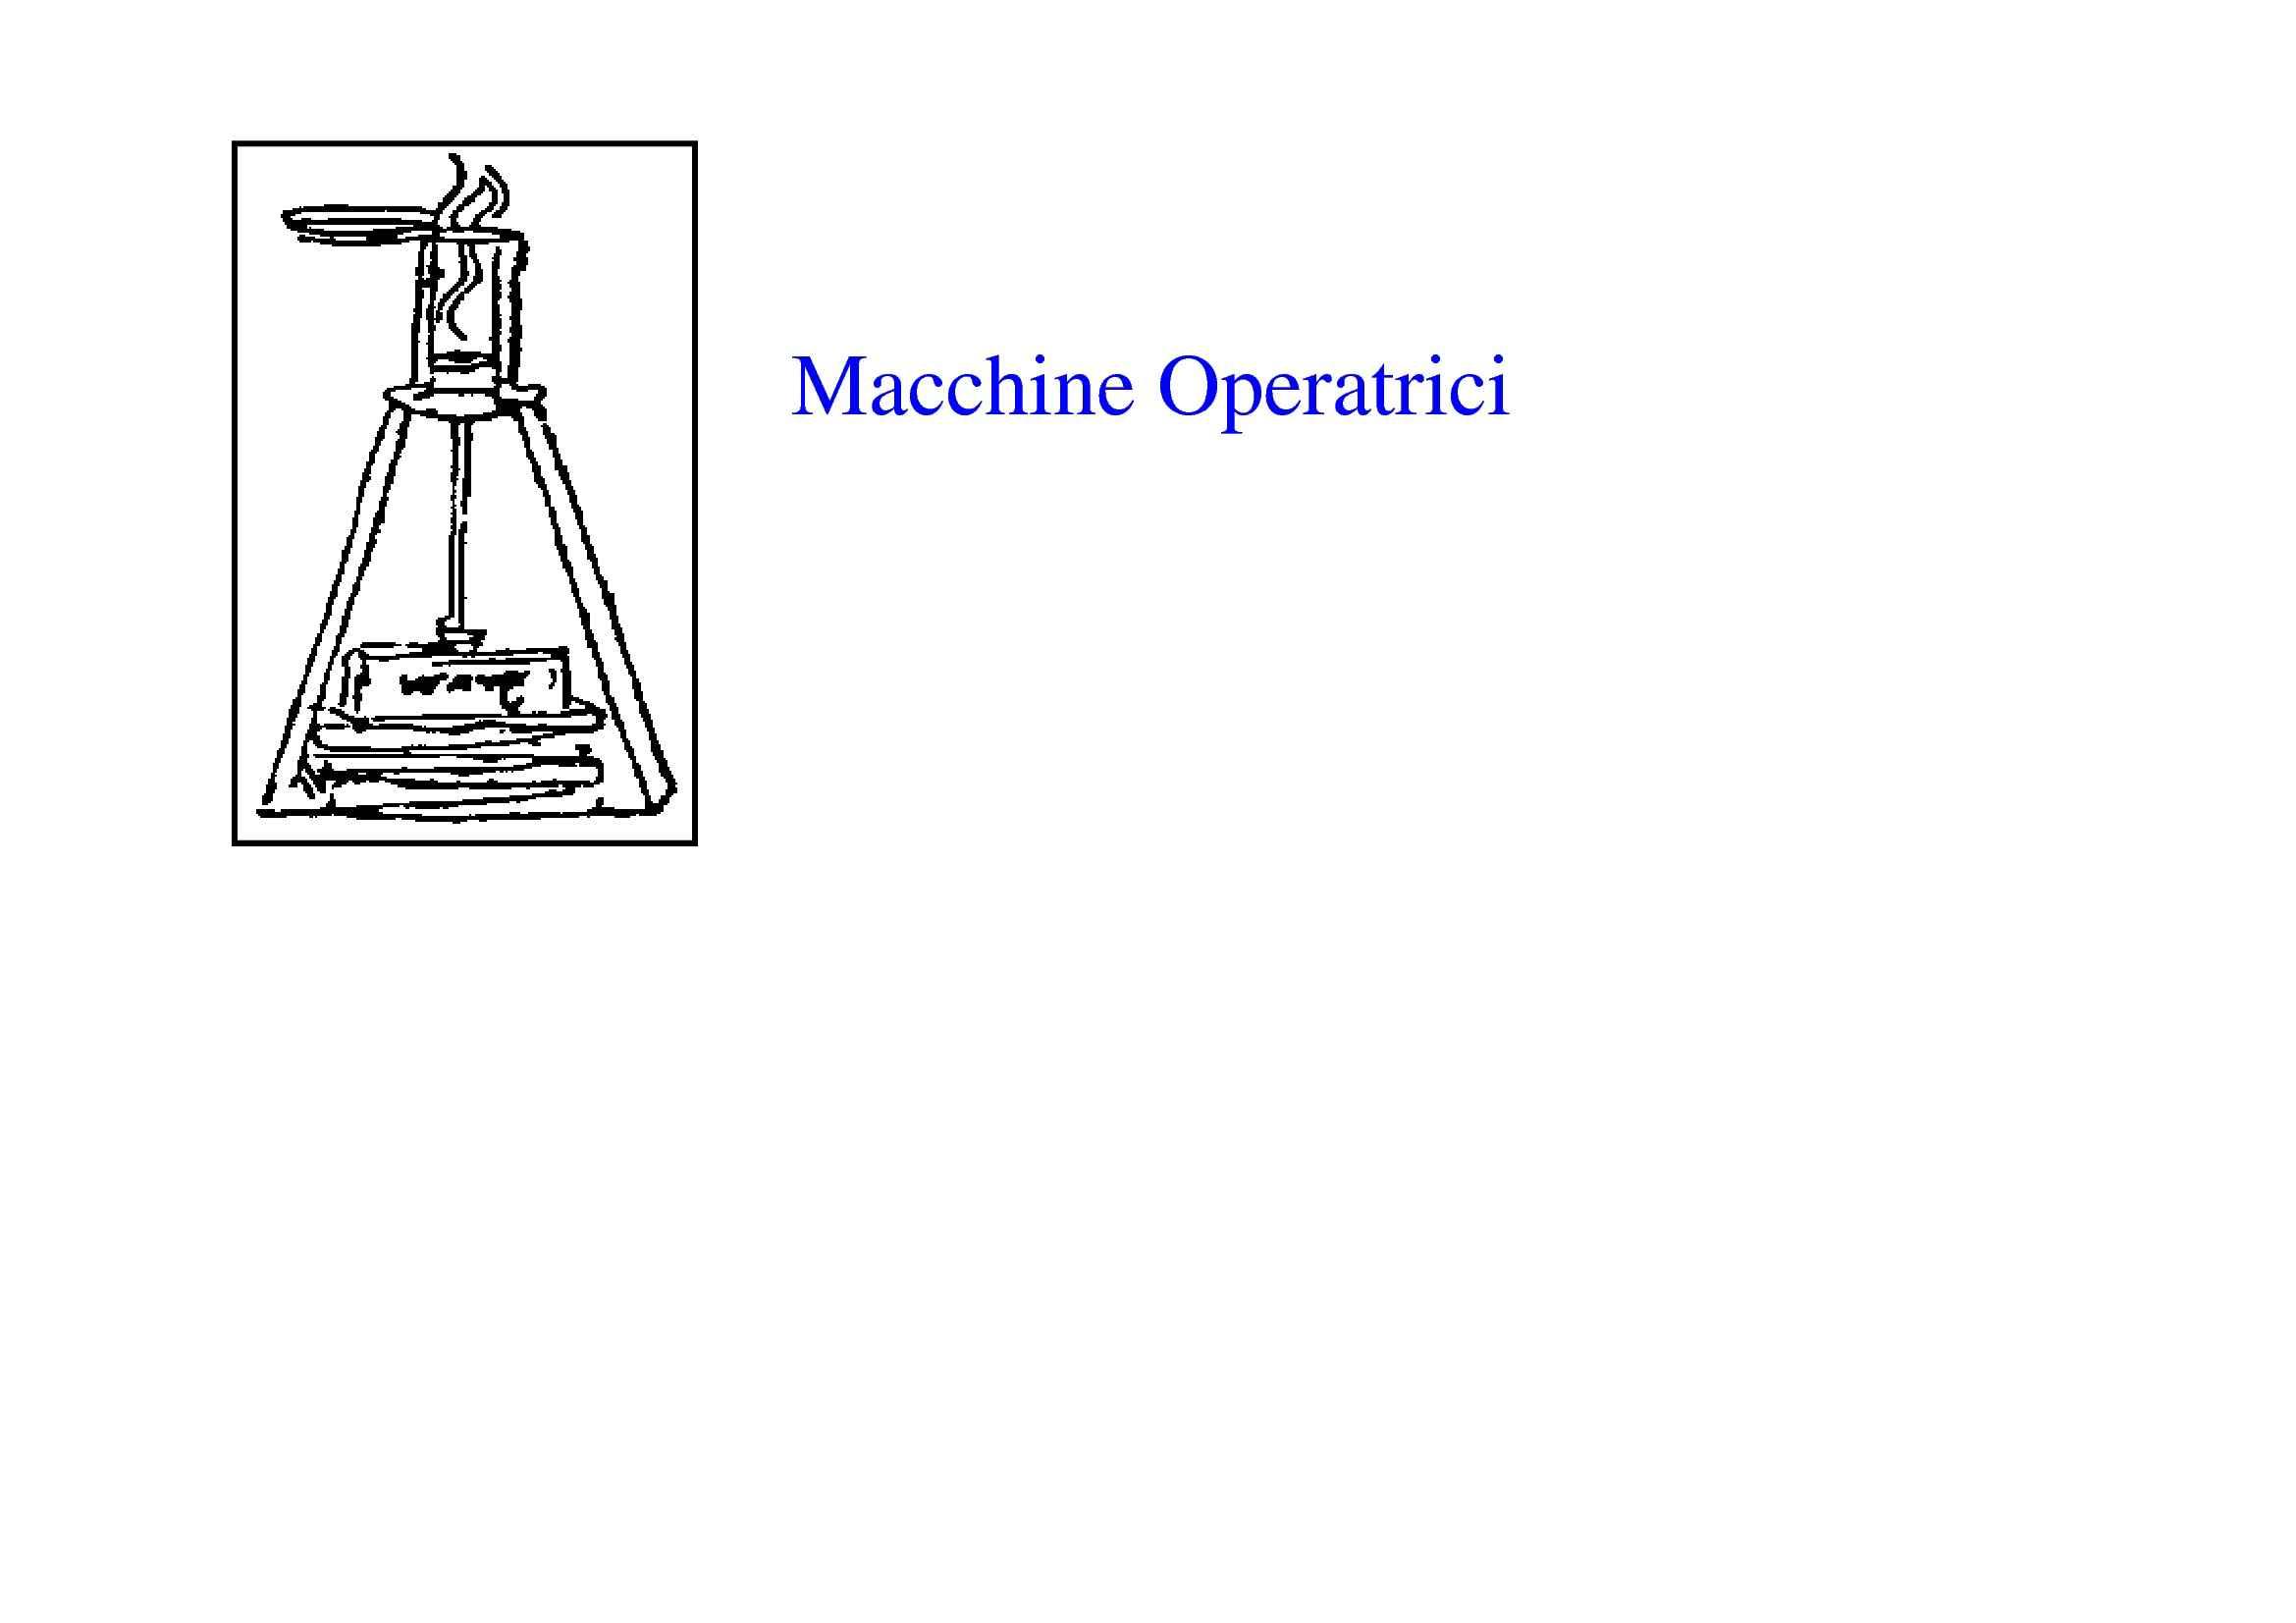 Turbomacchine - Macchine operatrici